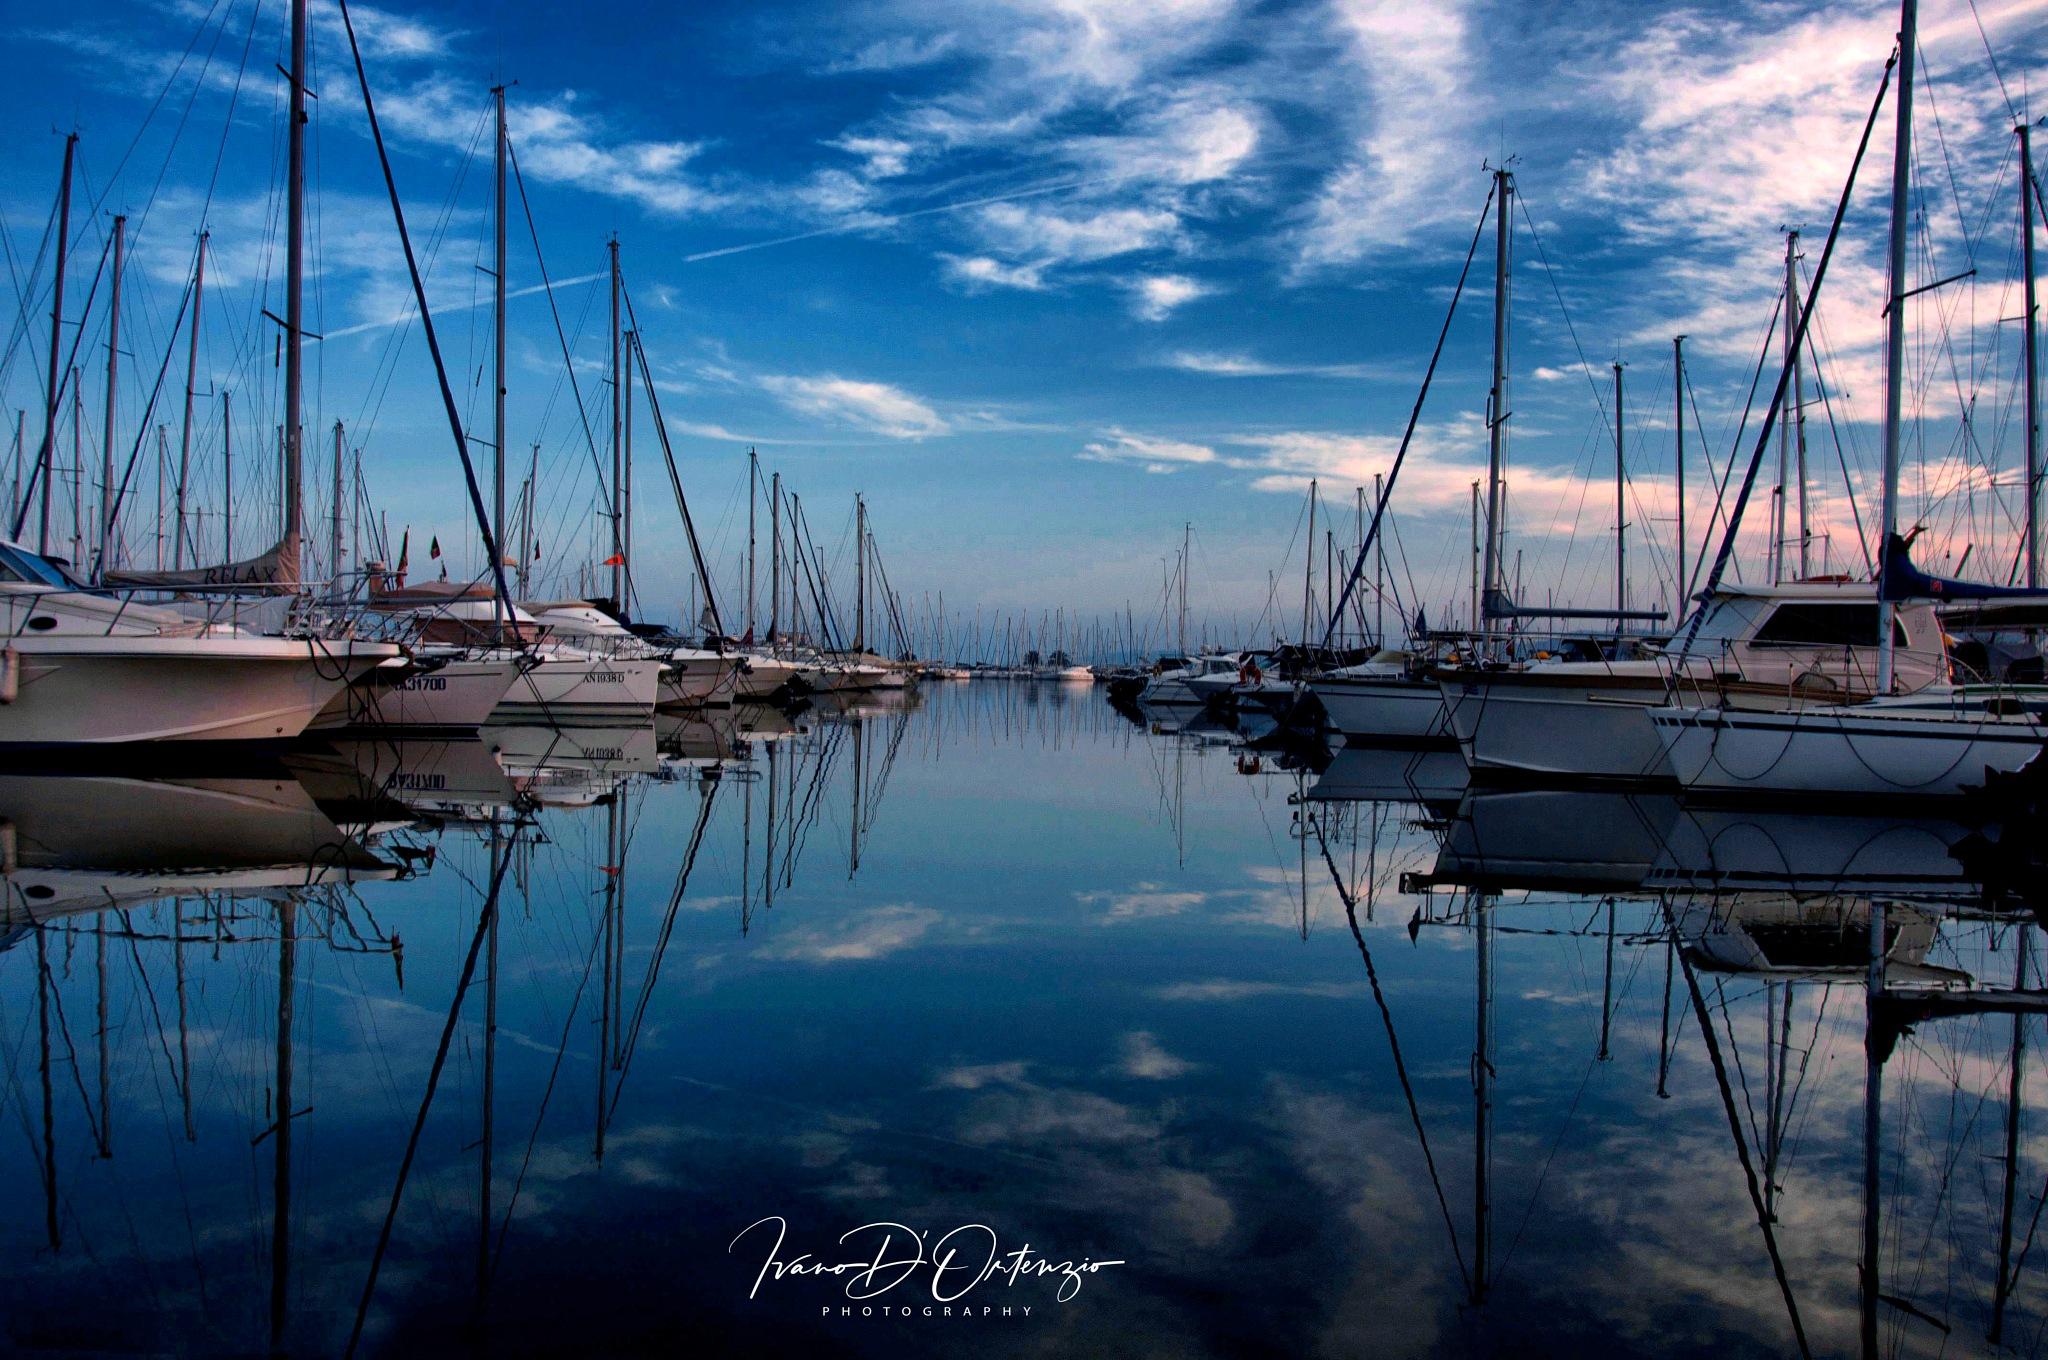 the Marina by Ivano D'Ortenzio